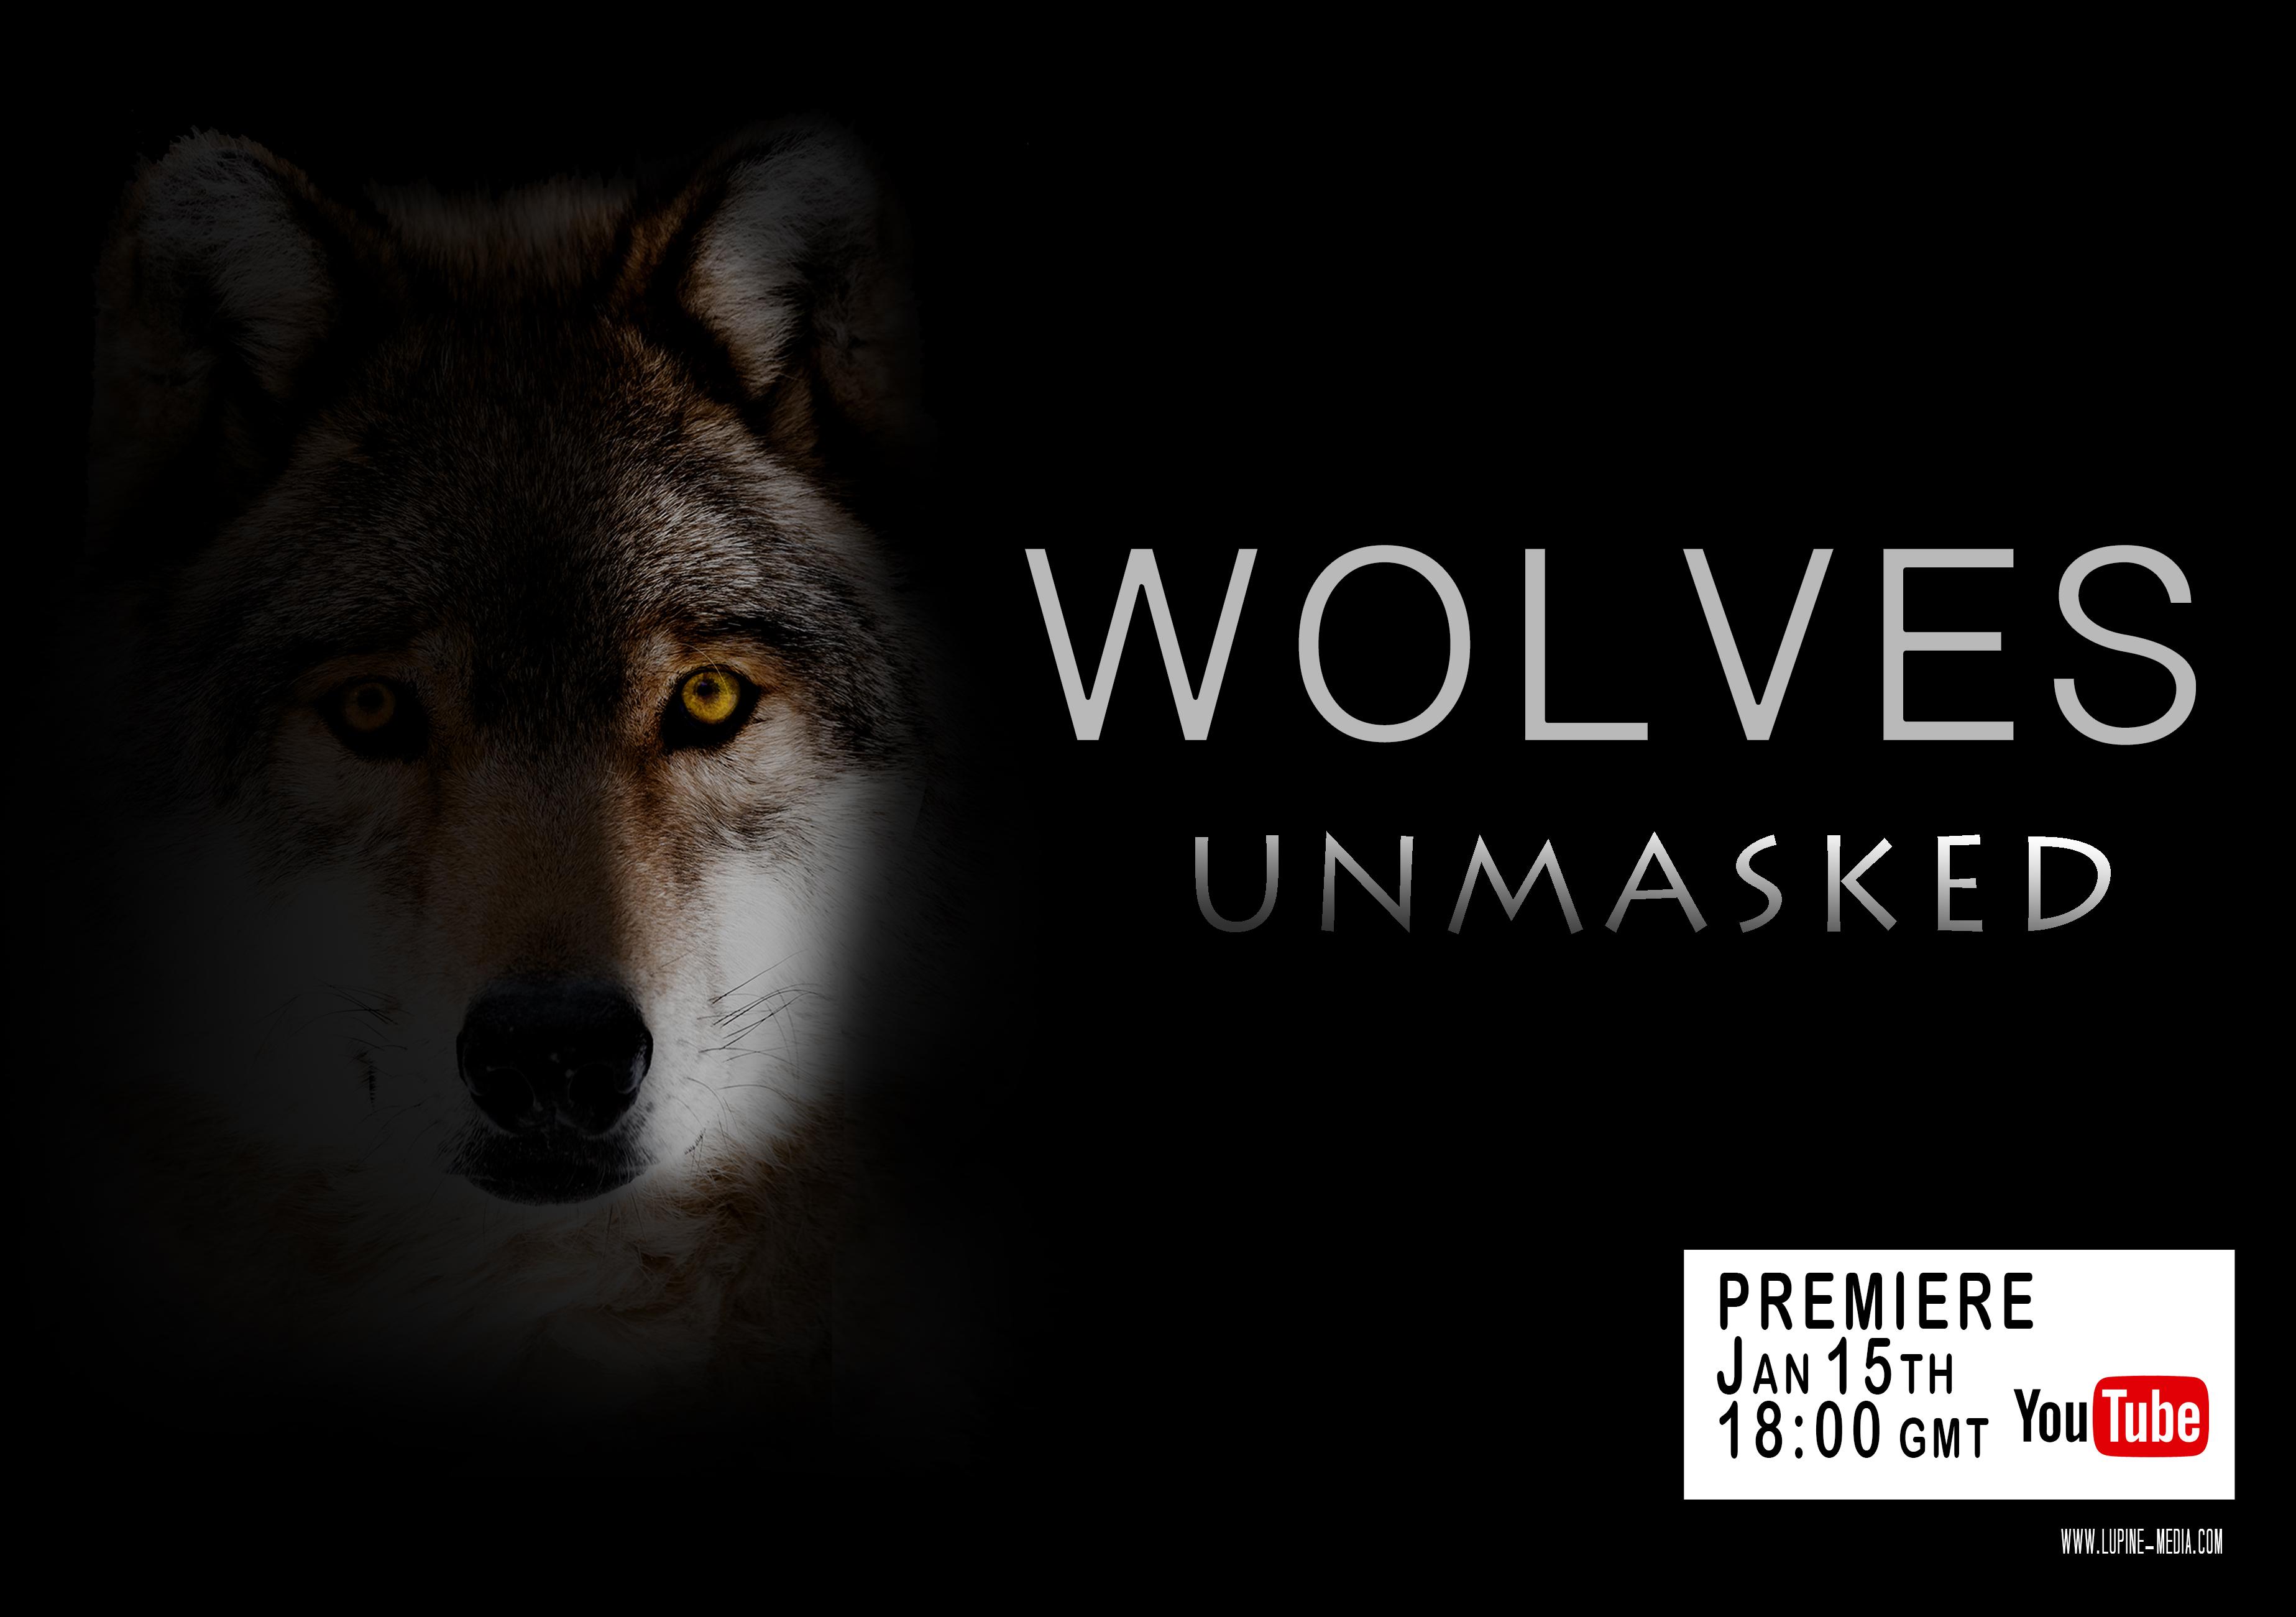 Wolves Unmasked Premiere